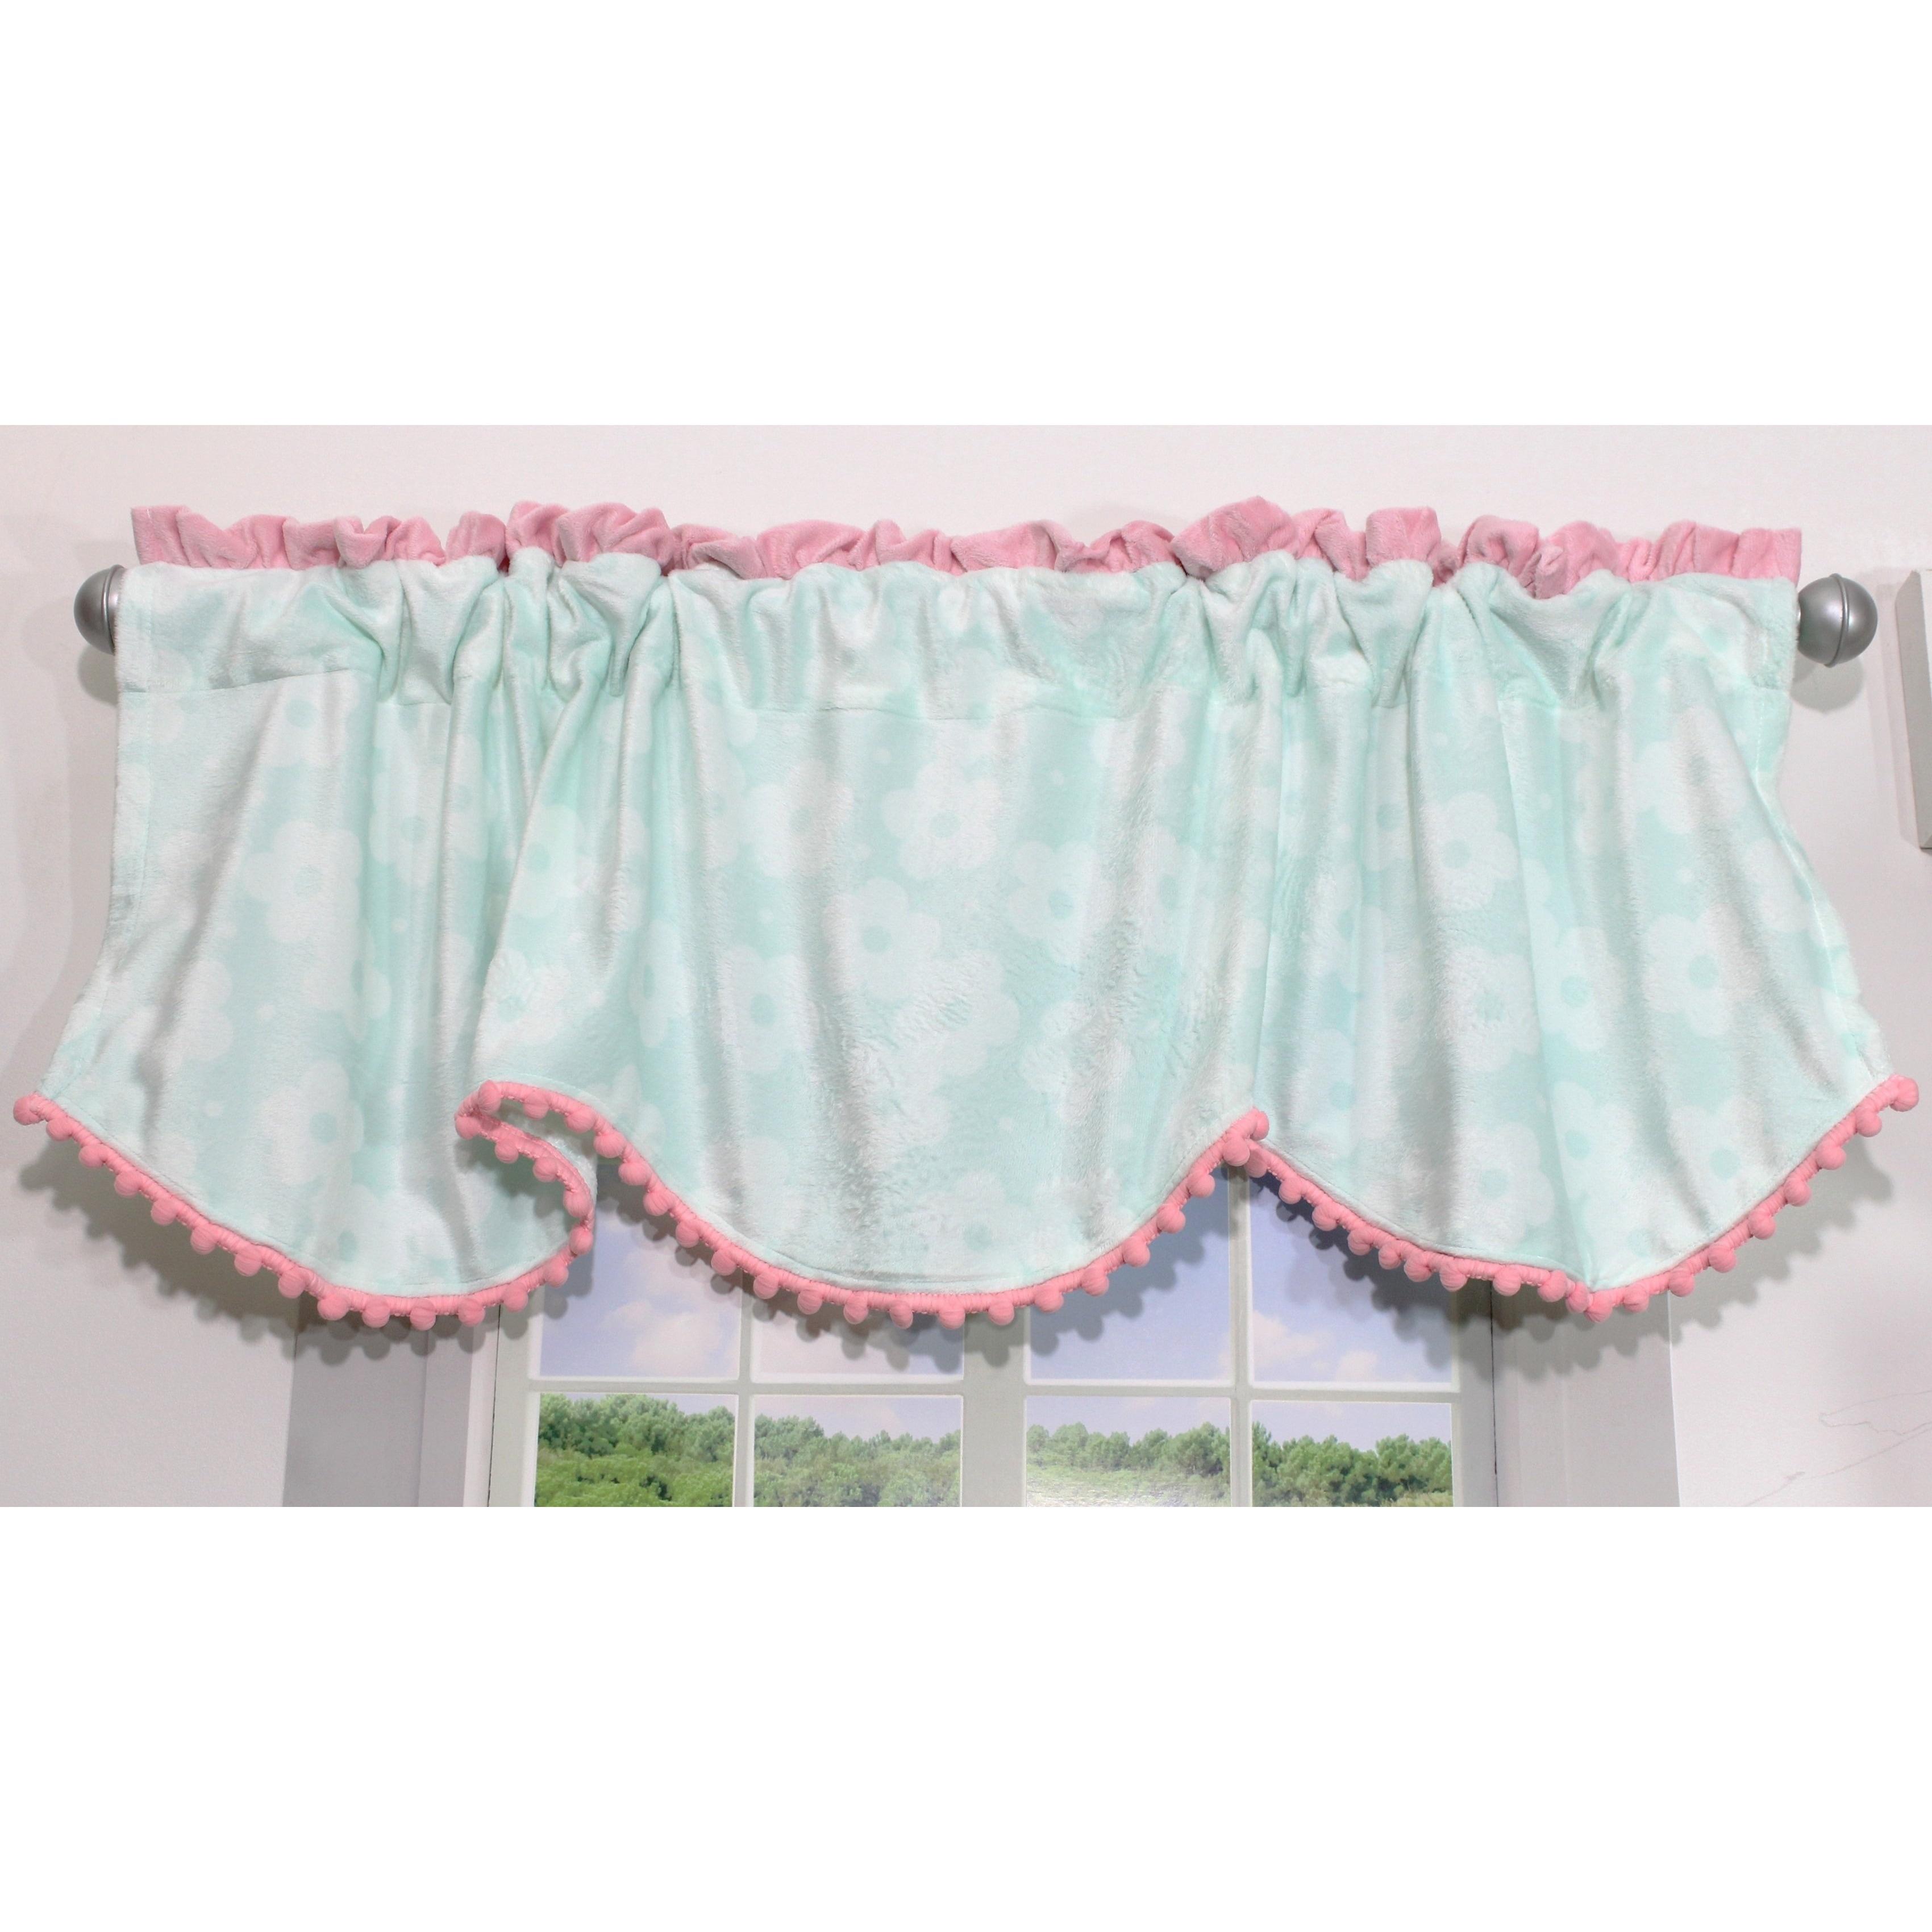 Nurture Imagination Wings Nursery Window Curtain Valance ...